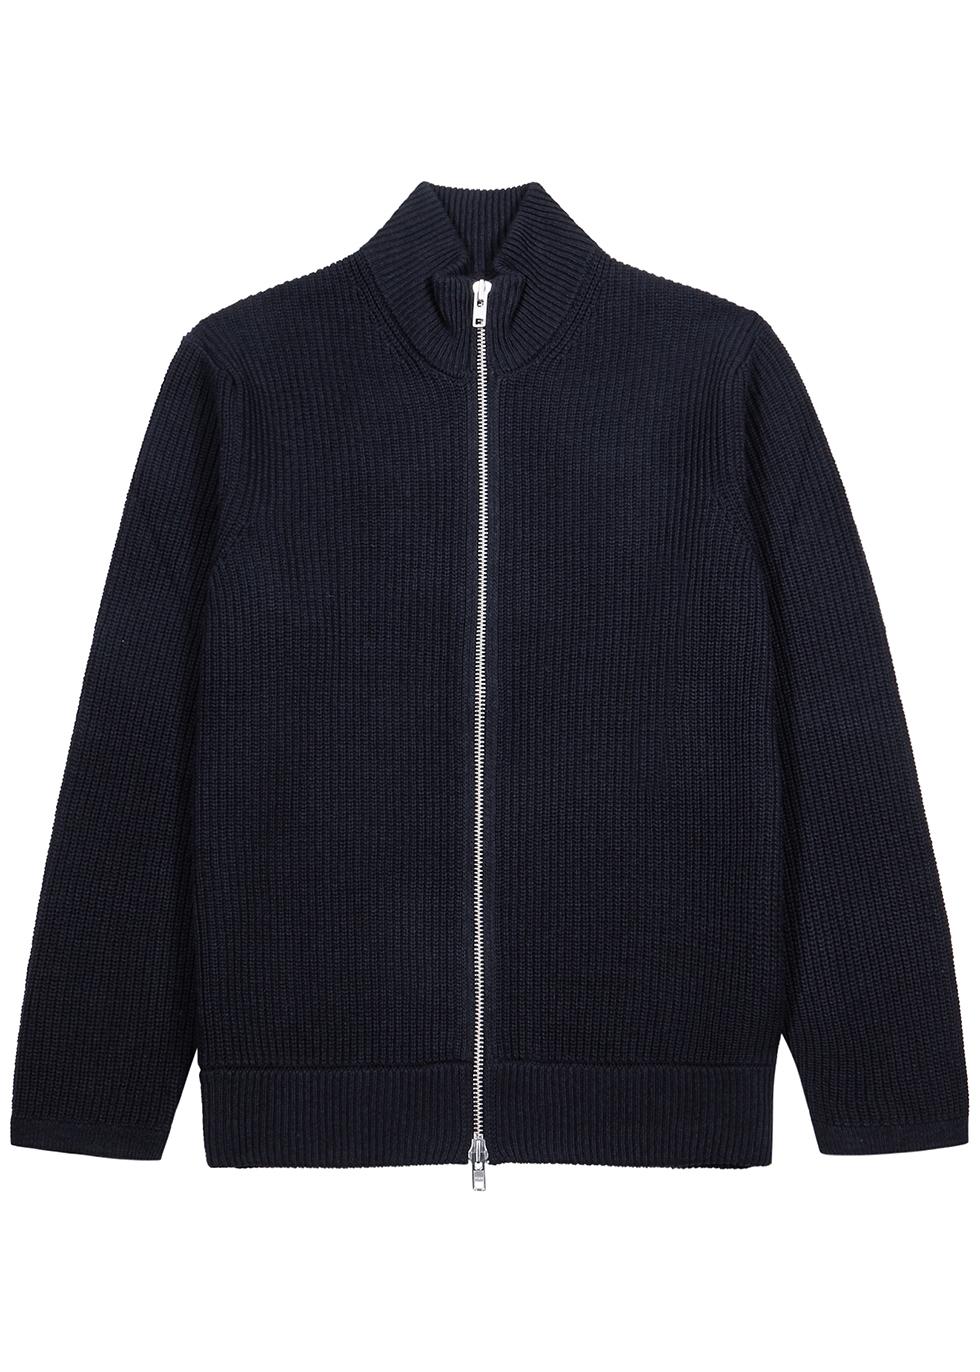 Piet navy ribbed cotton-blend cardigan